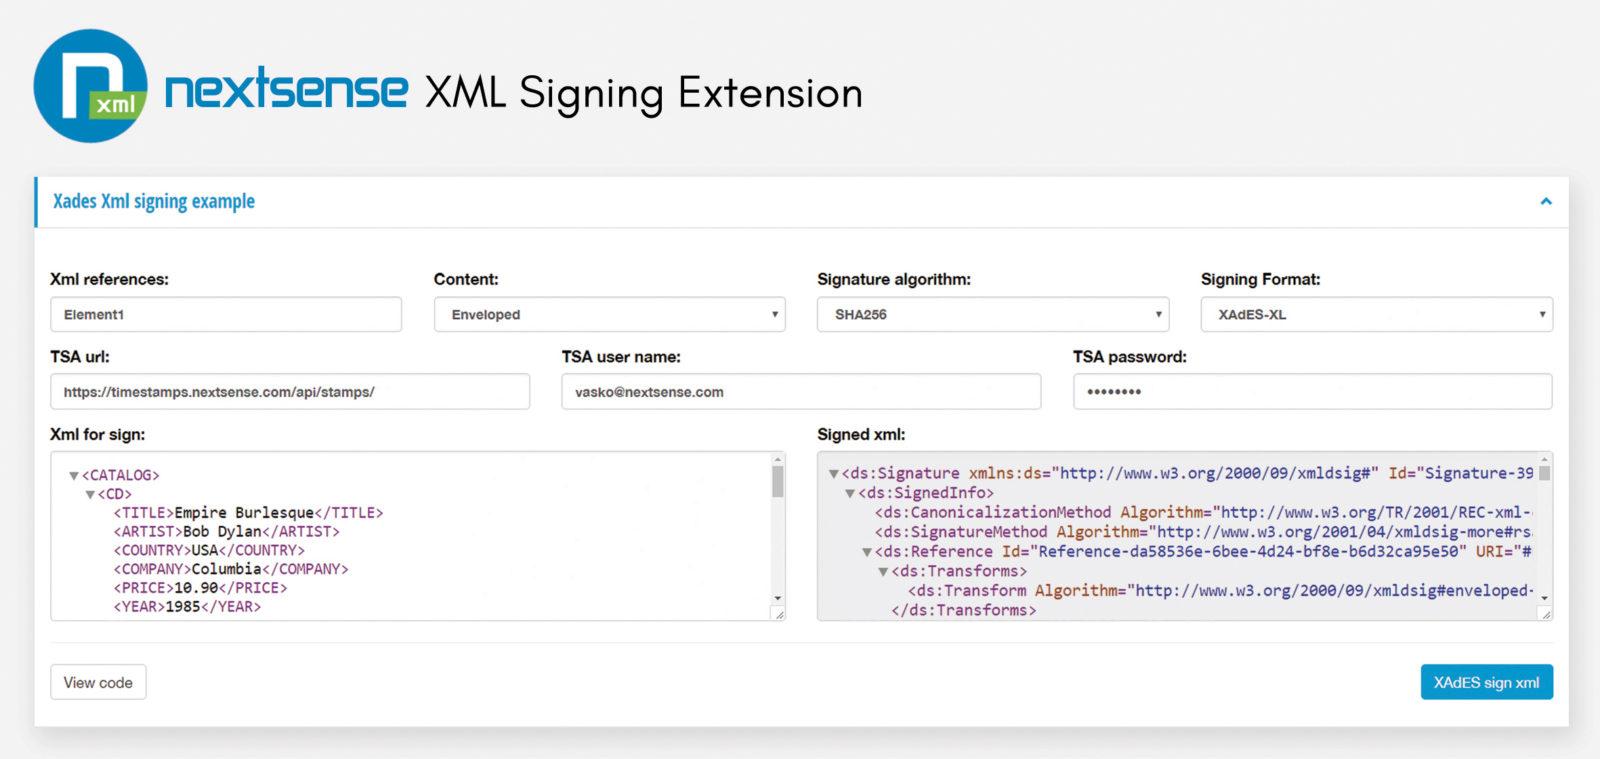 NextSense Signing Extension: Potpisano, zapečaćeno, isporučeno